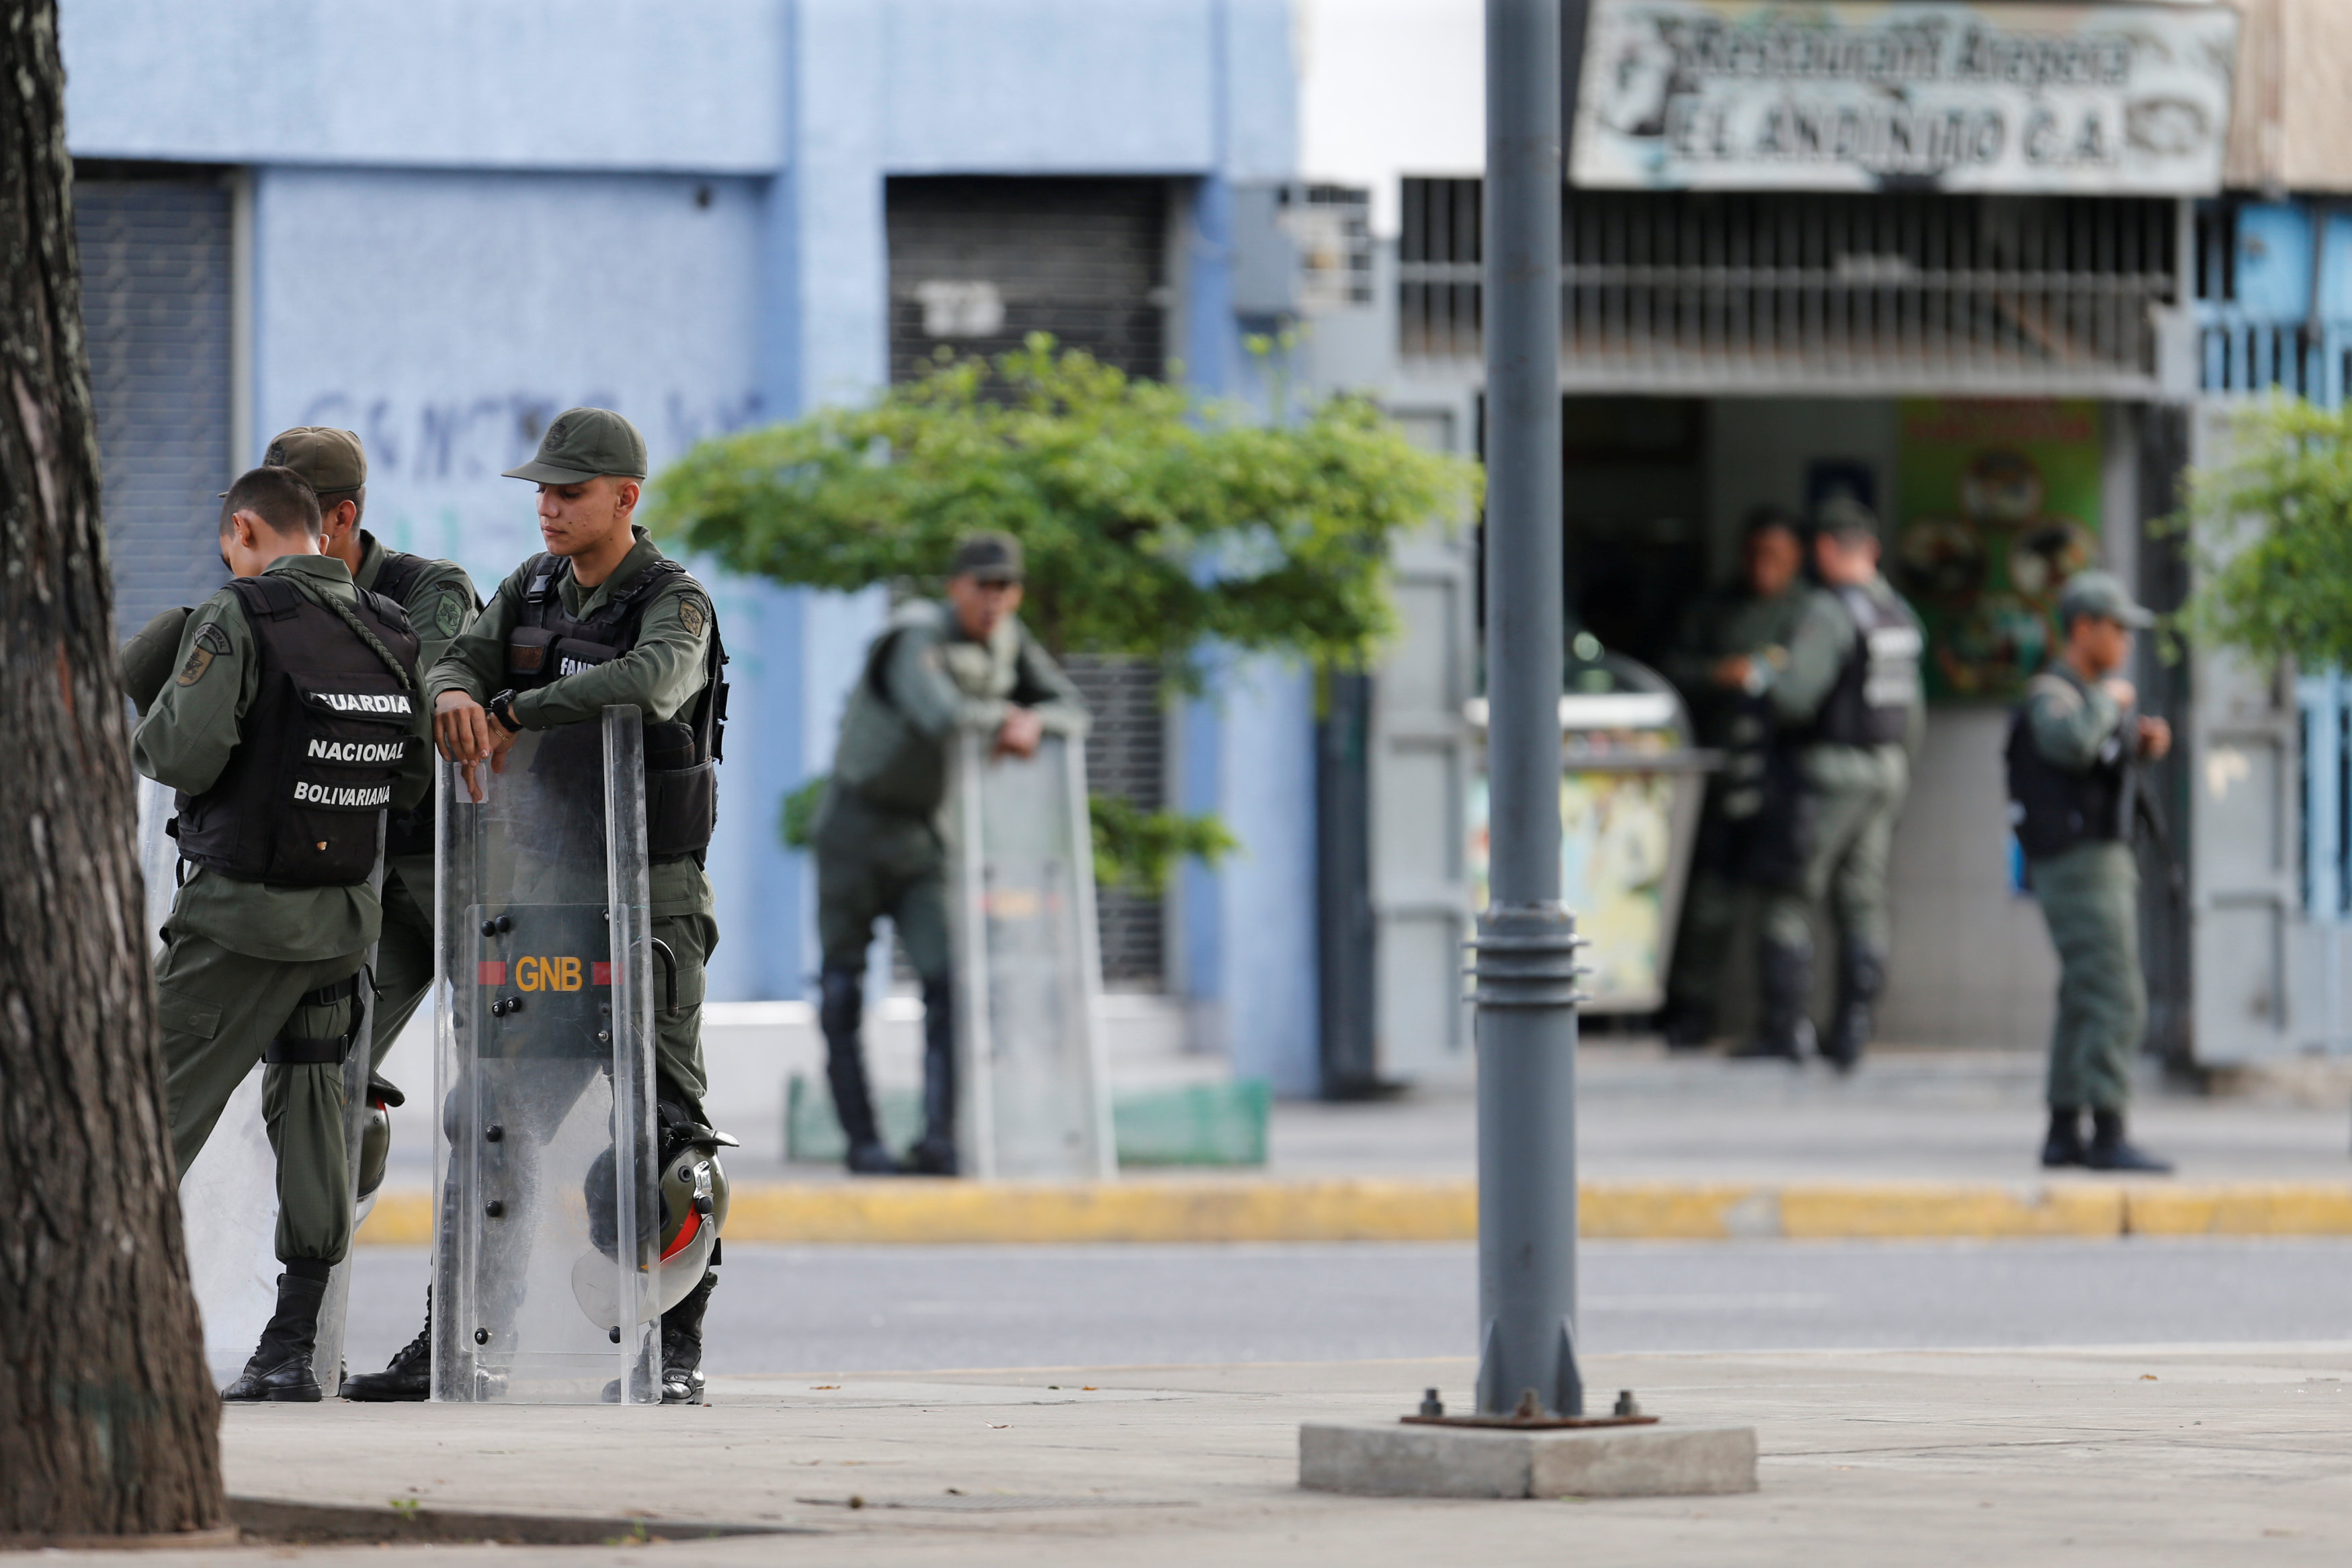 In pictures: Crisis-hit Venezuela forces guard prosecutors office